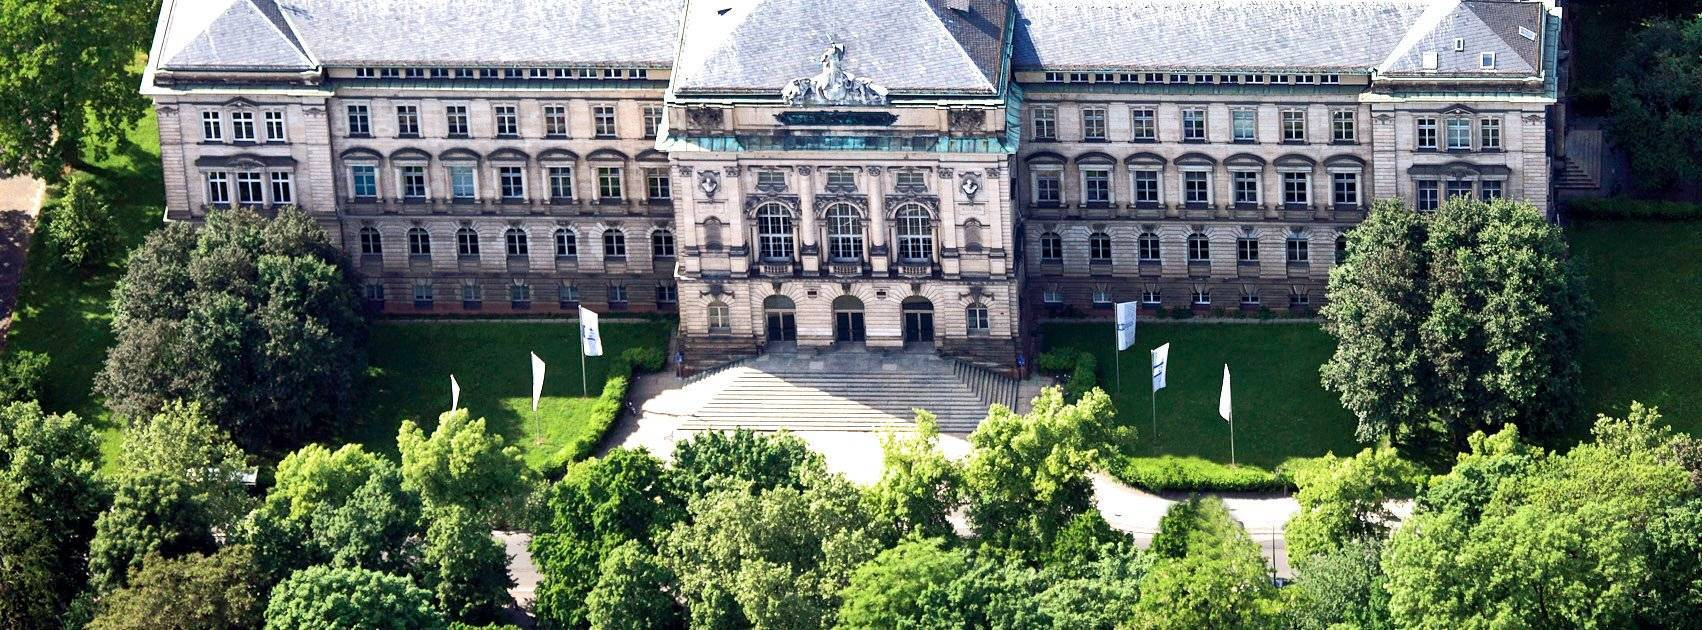 Uni Würzburg Medizin studieren